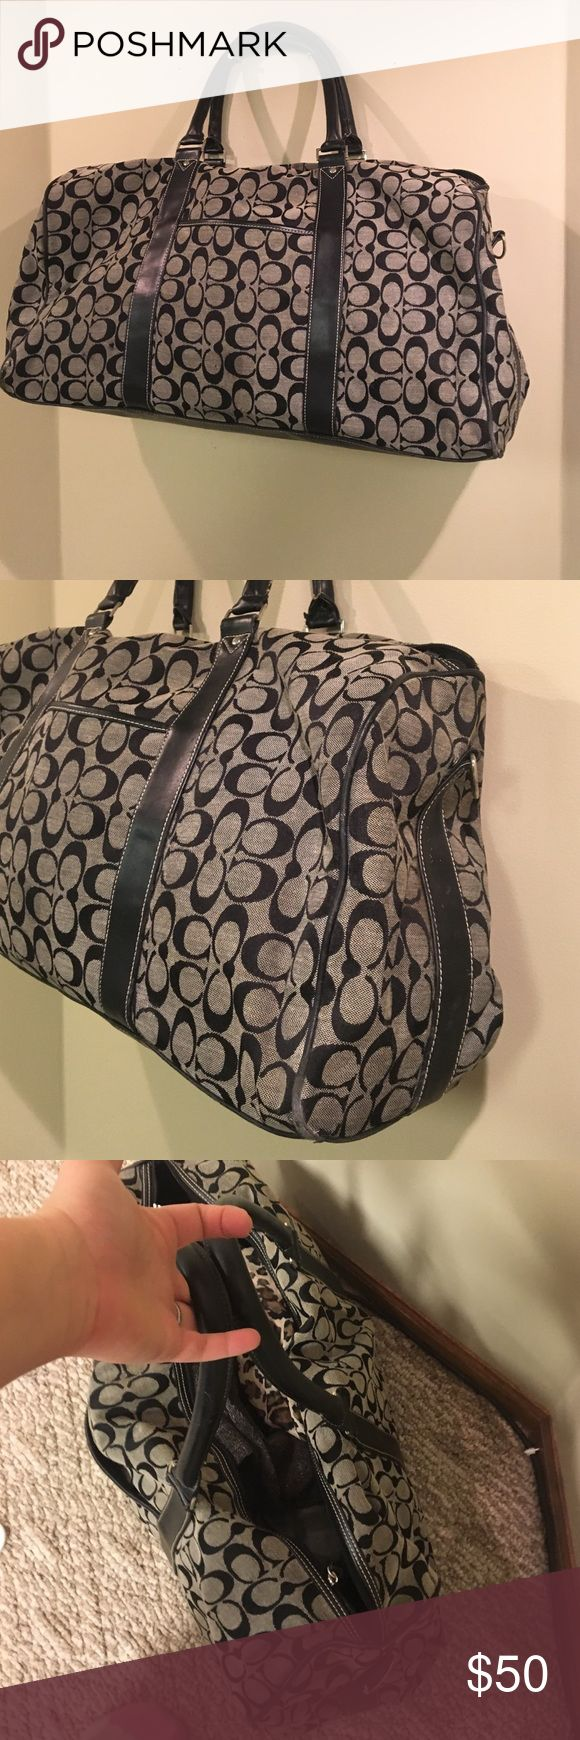 "Coach Duffle Bag Authentic Authentic Coach Duffle bag. 23"" by 7"" Coach Bags Travel Bags"